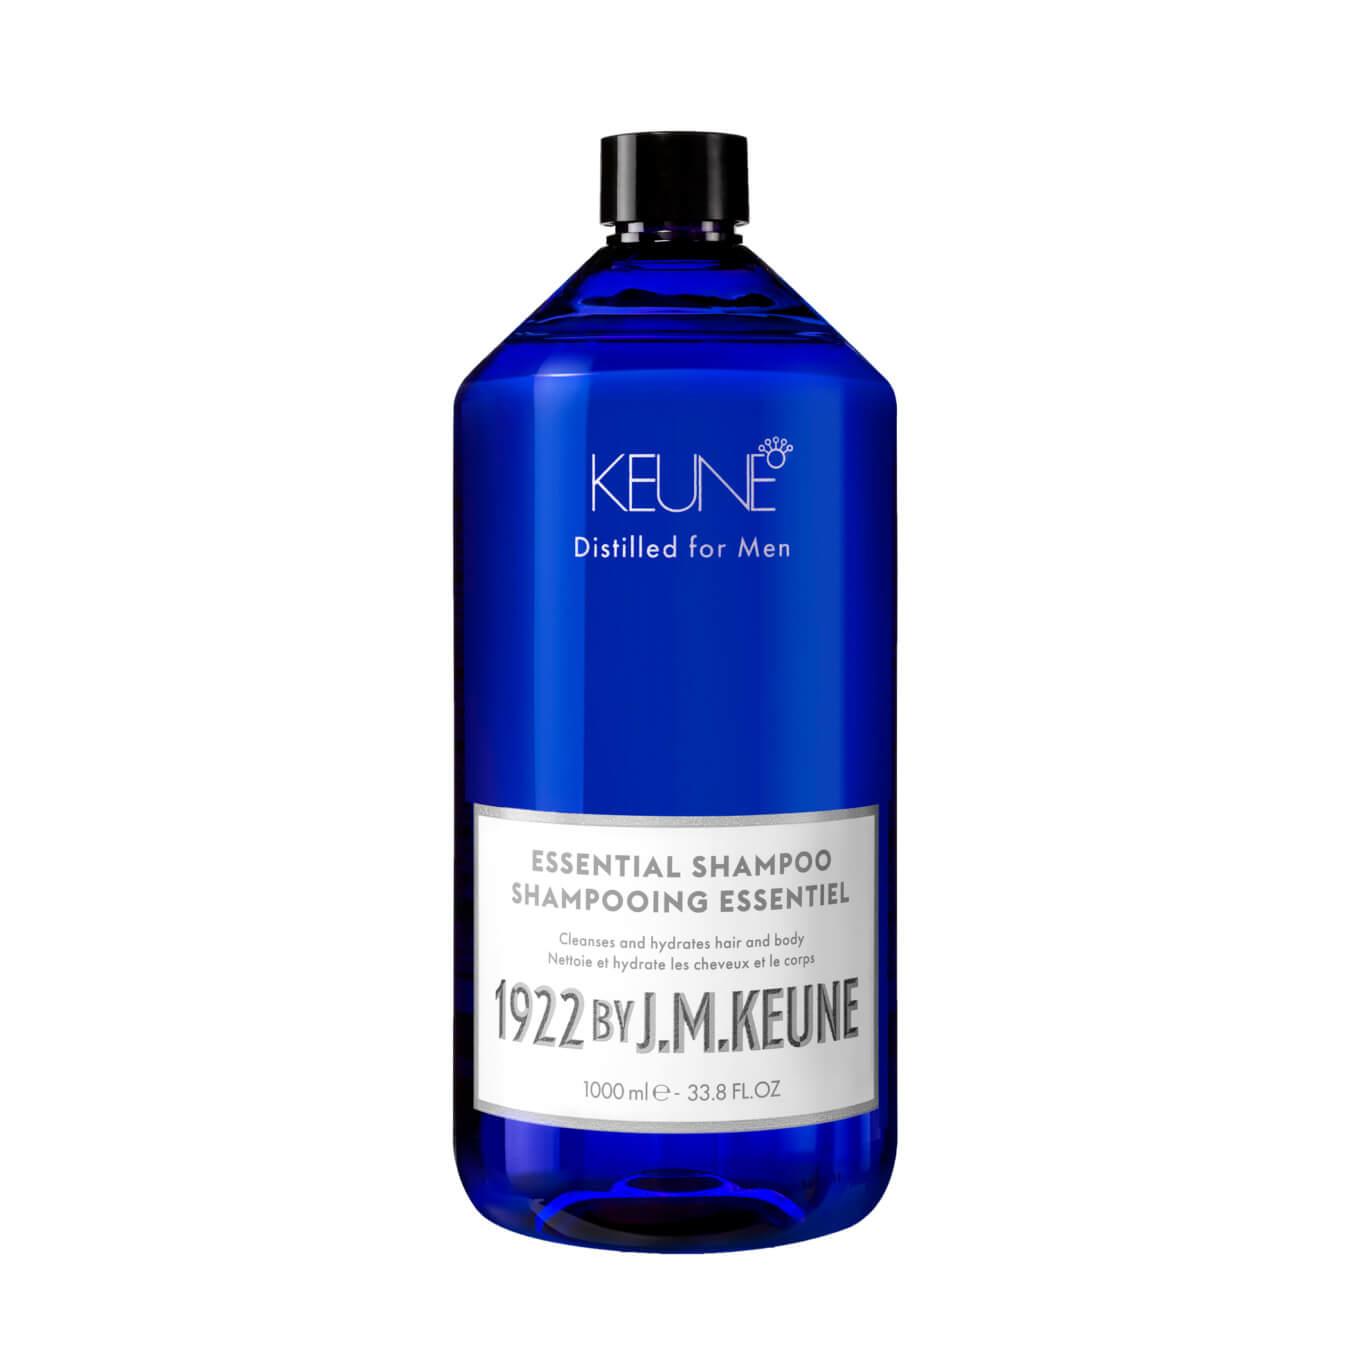 Kauf 1922 By JM Keune Essential Shampoo 1000ml